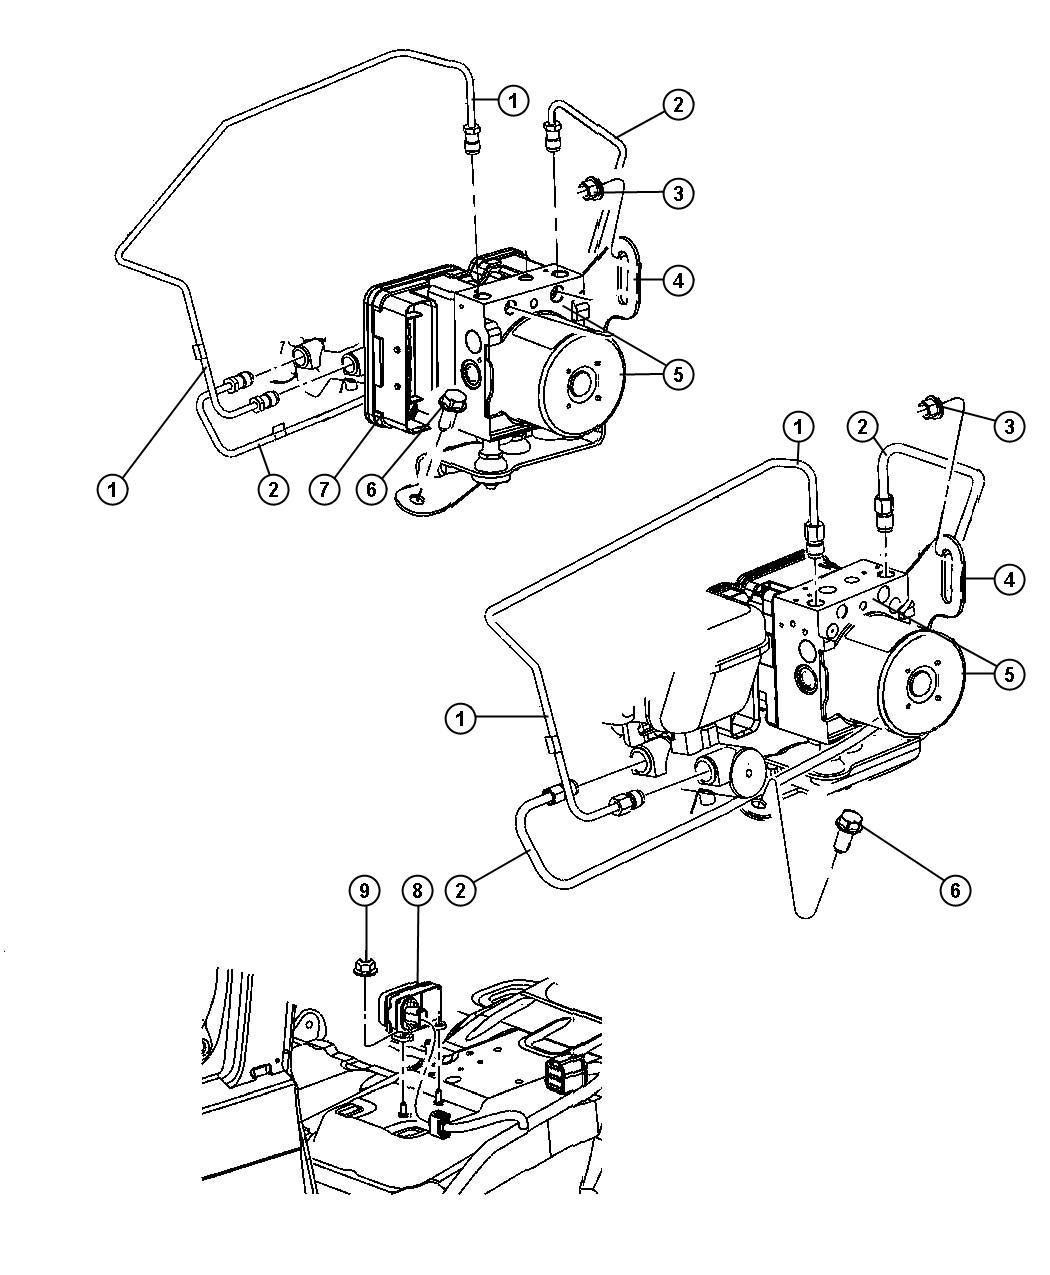 2006 Jeep Commander Control unit. Anti-lock brake. Hcu